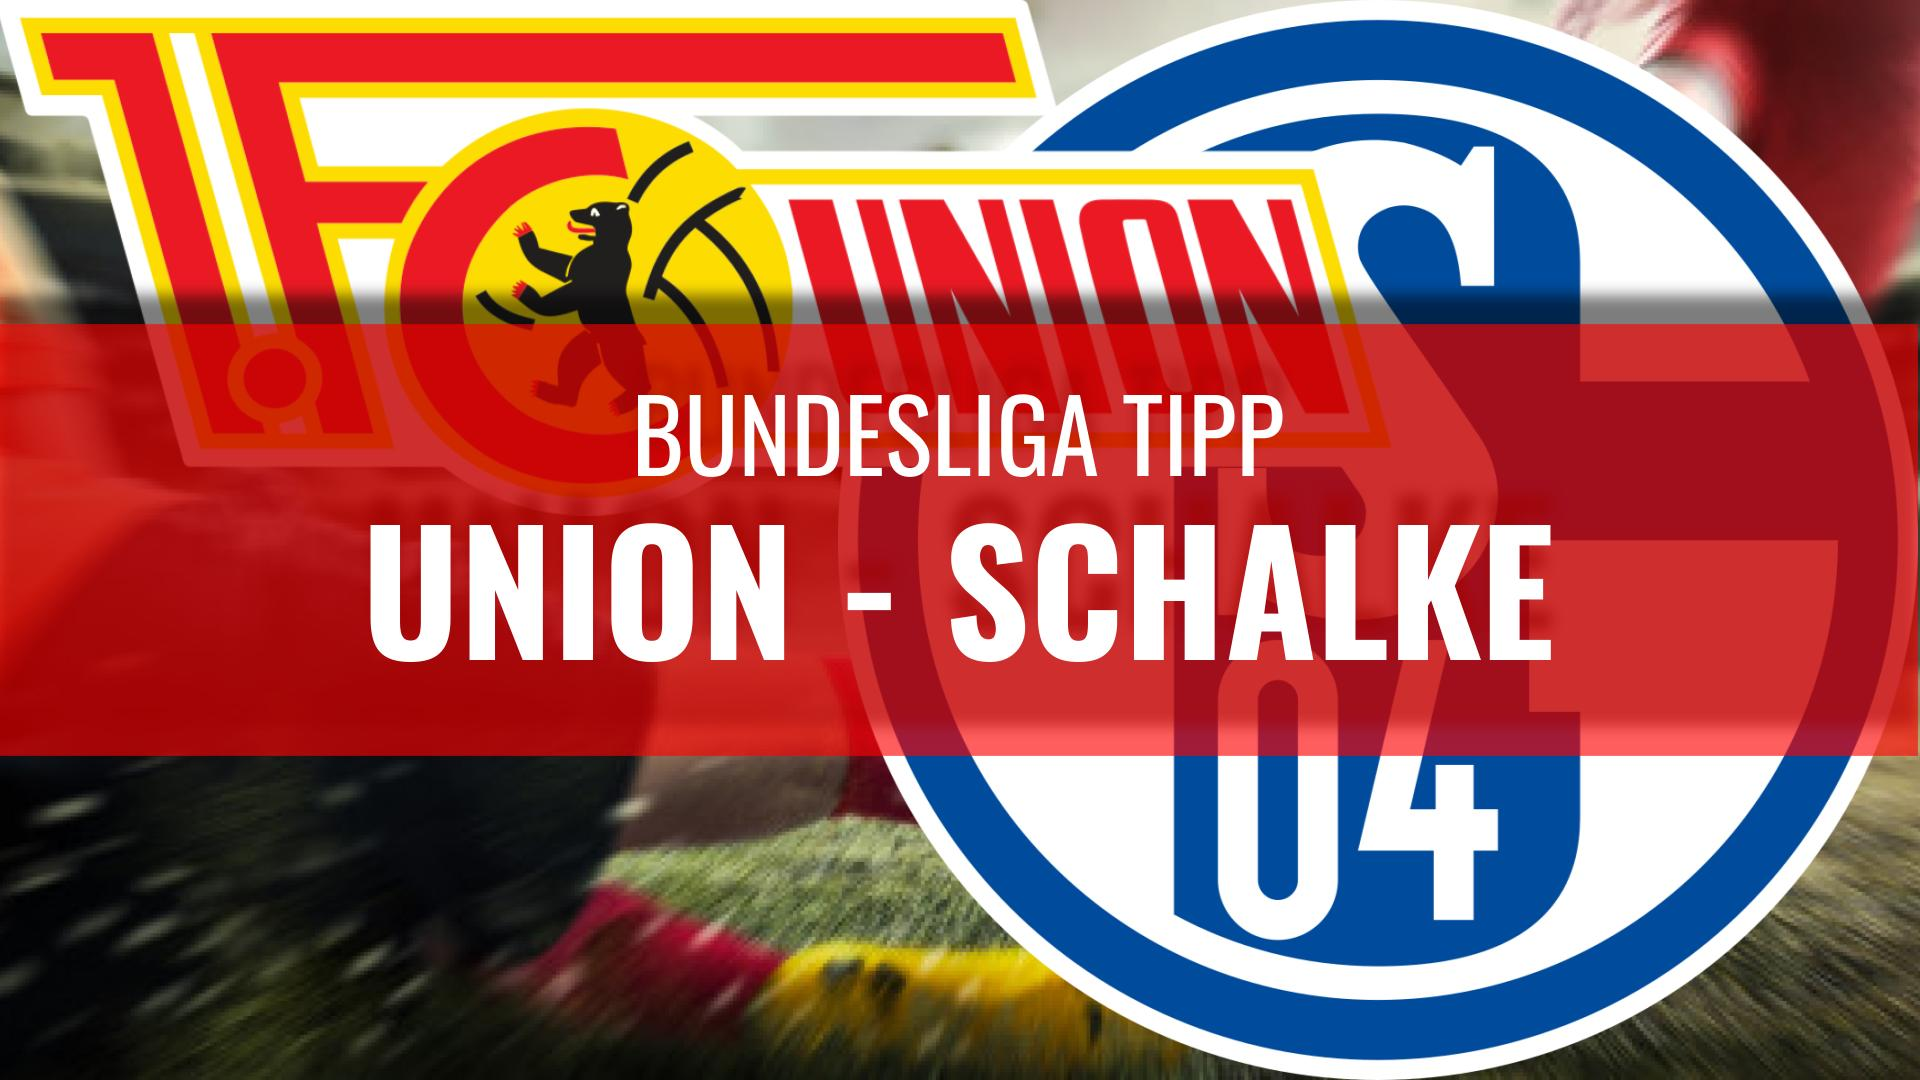 UNION - SCHALKE-Bundesliga-Wett-Tipps-21